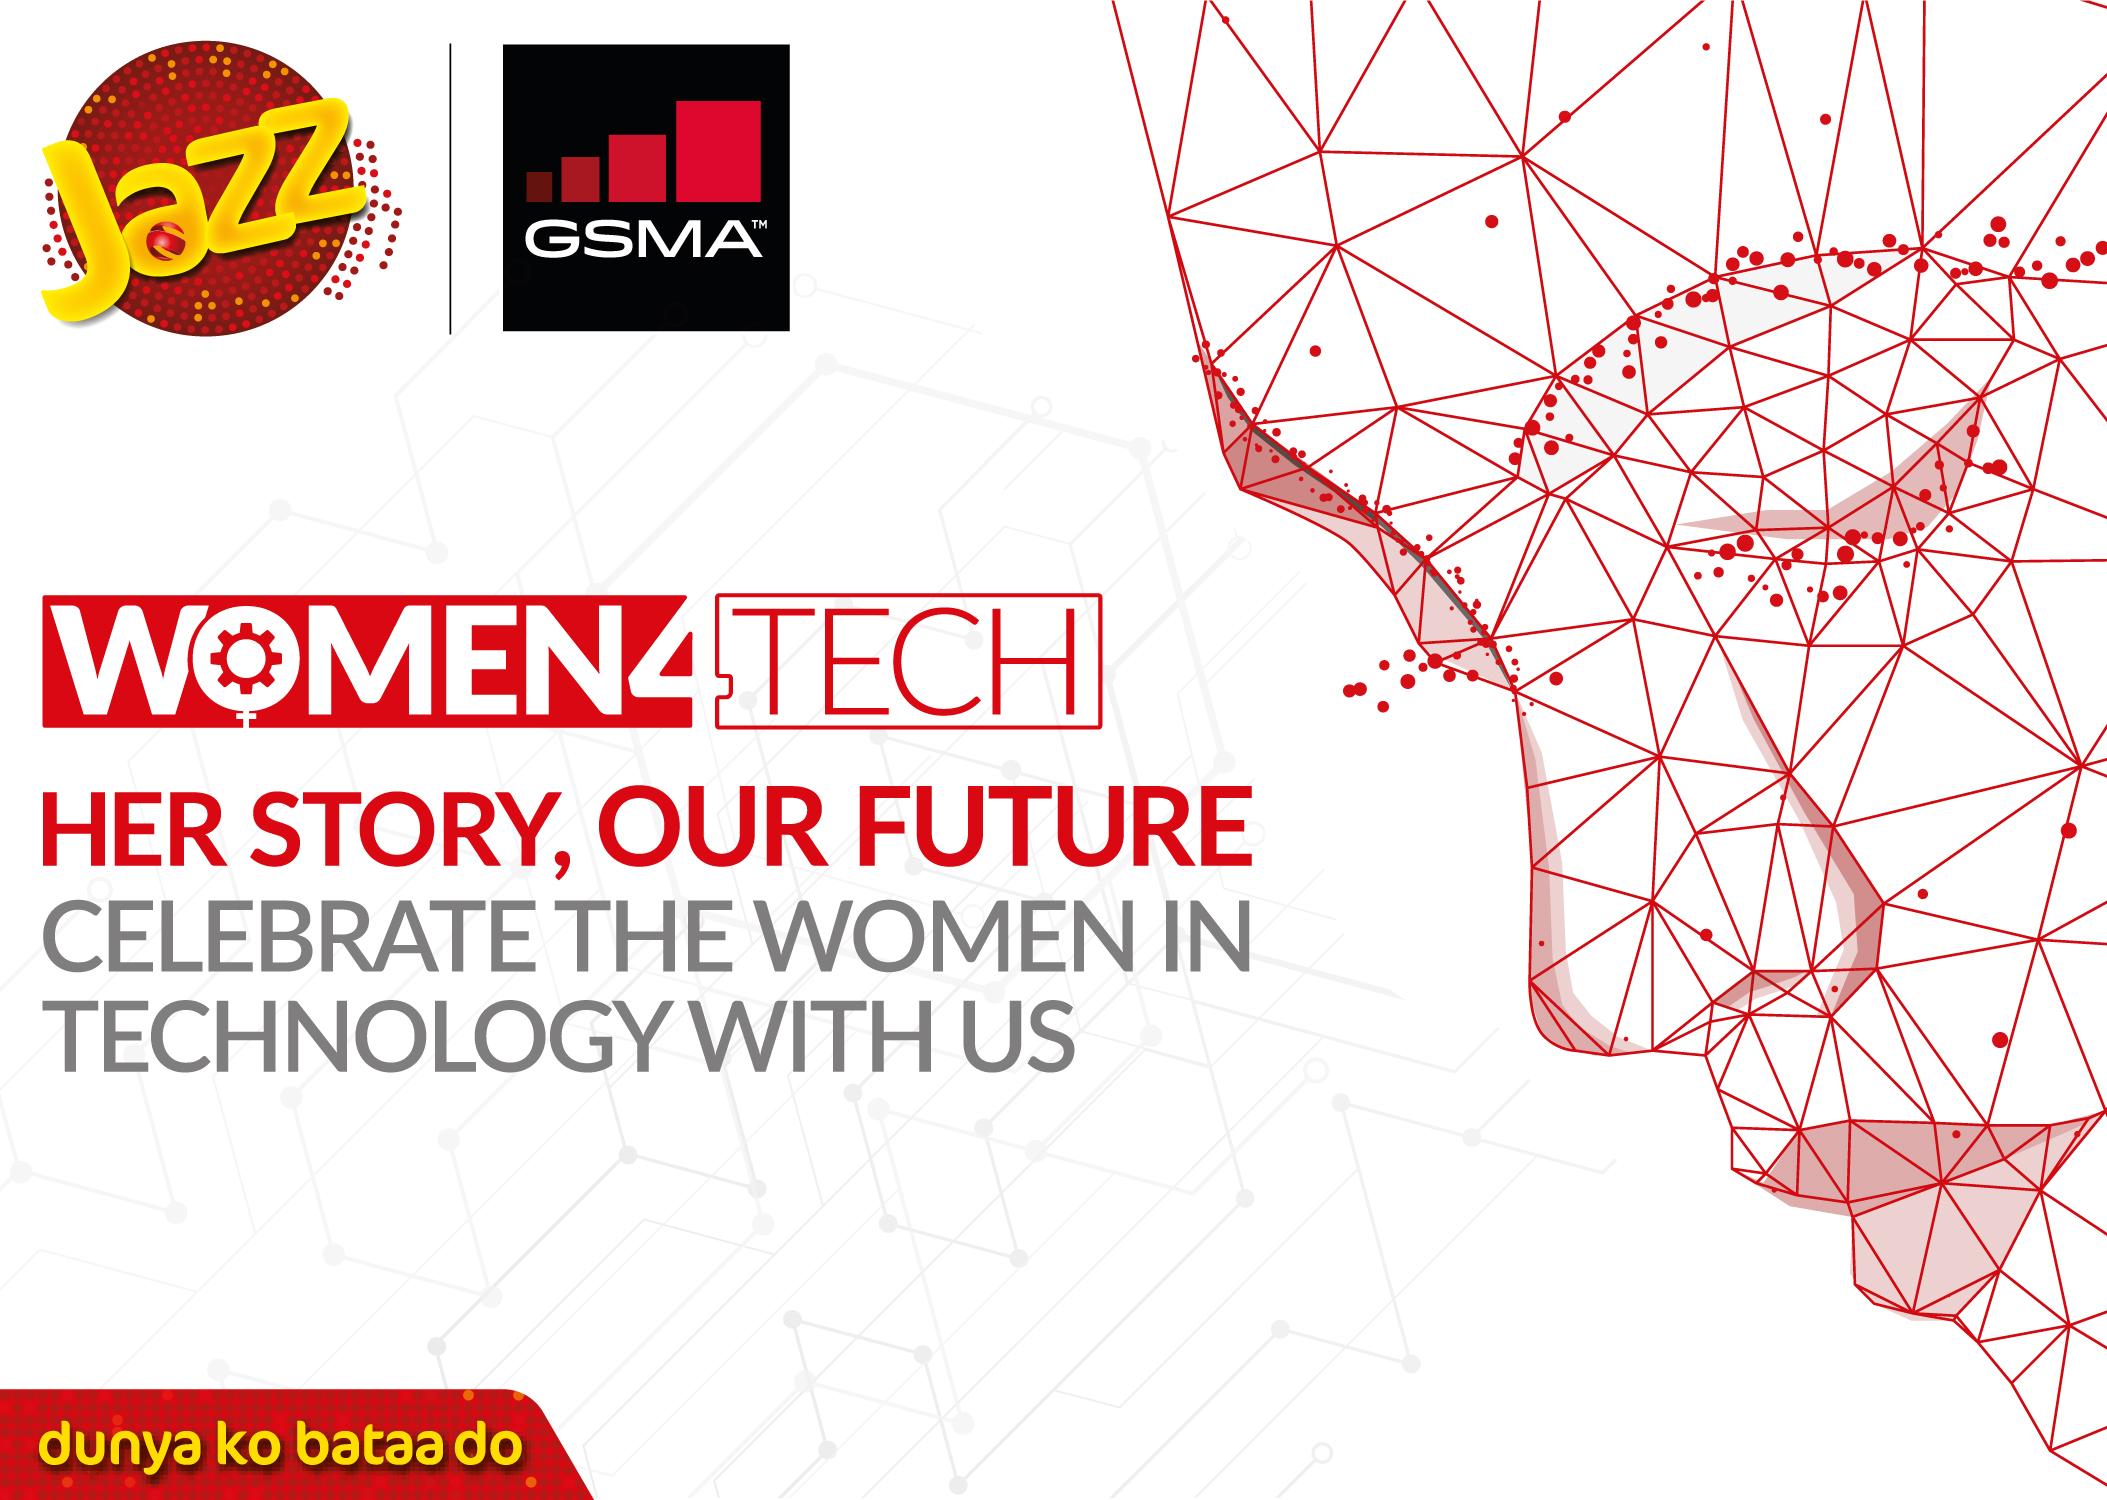 Women4Tech Summit – powered by GSMA and Jazz